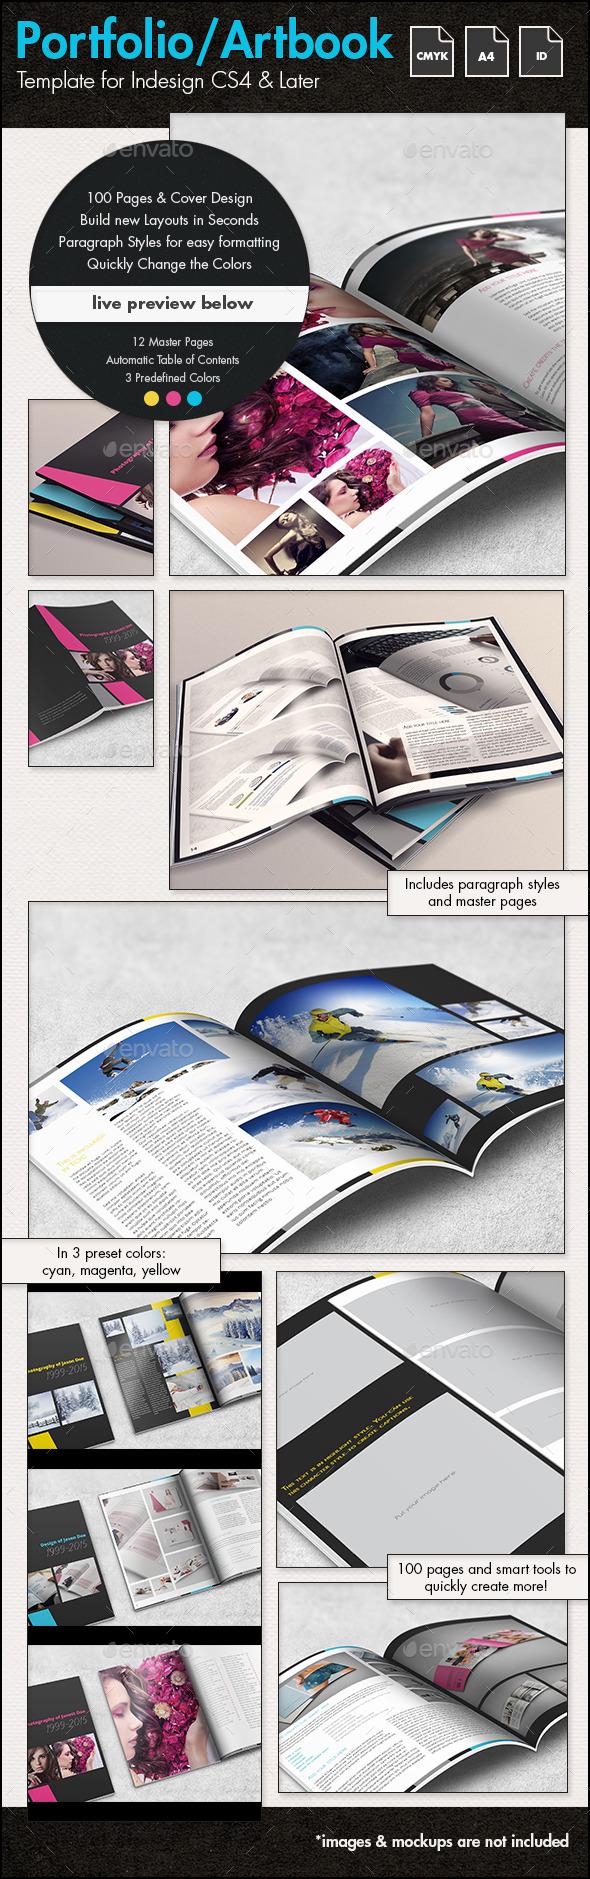 GraphicRiver Photofolio & Artbook Template A4 Portrait 11008699